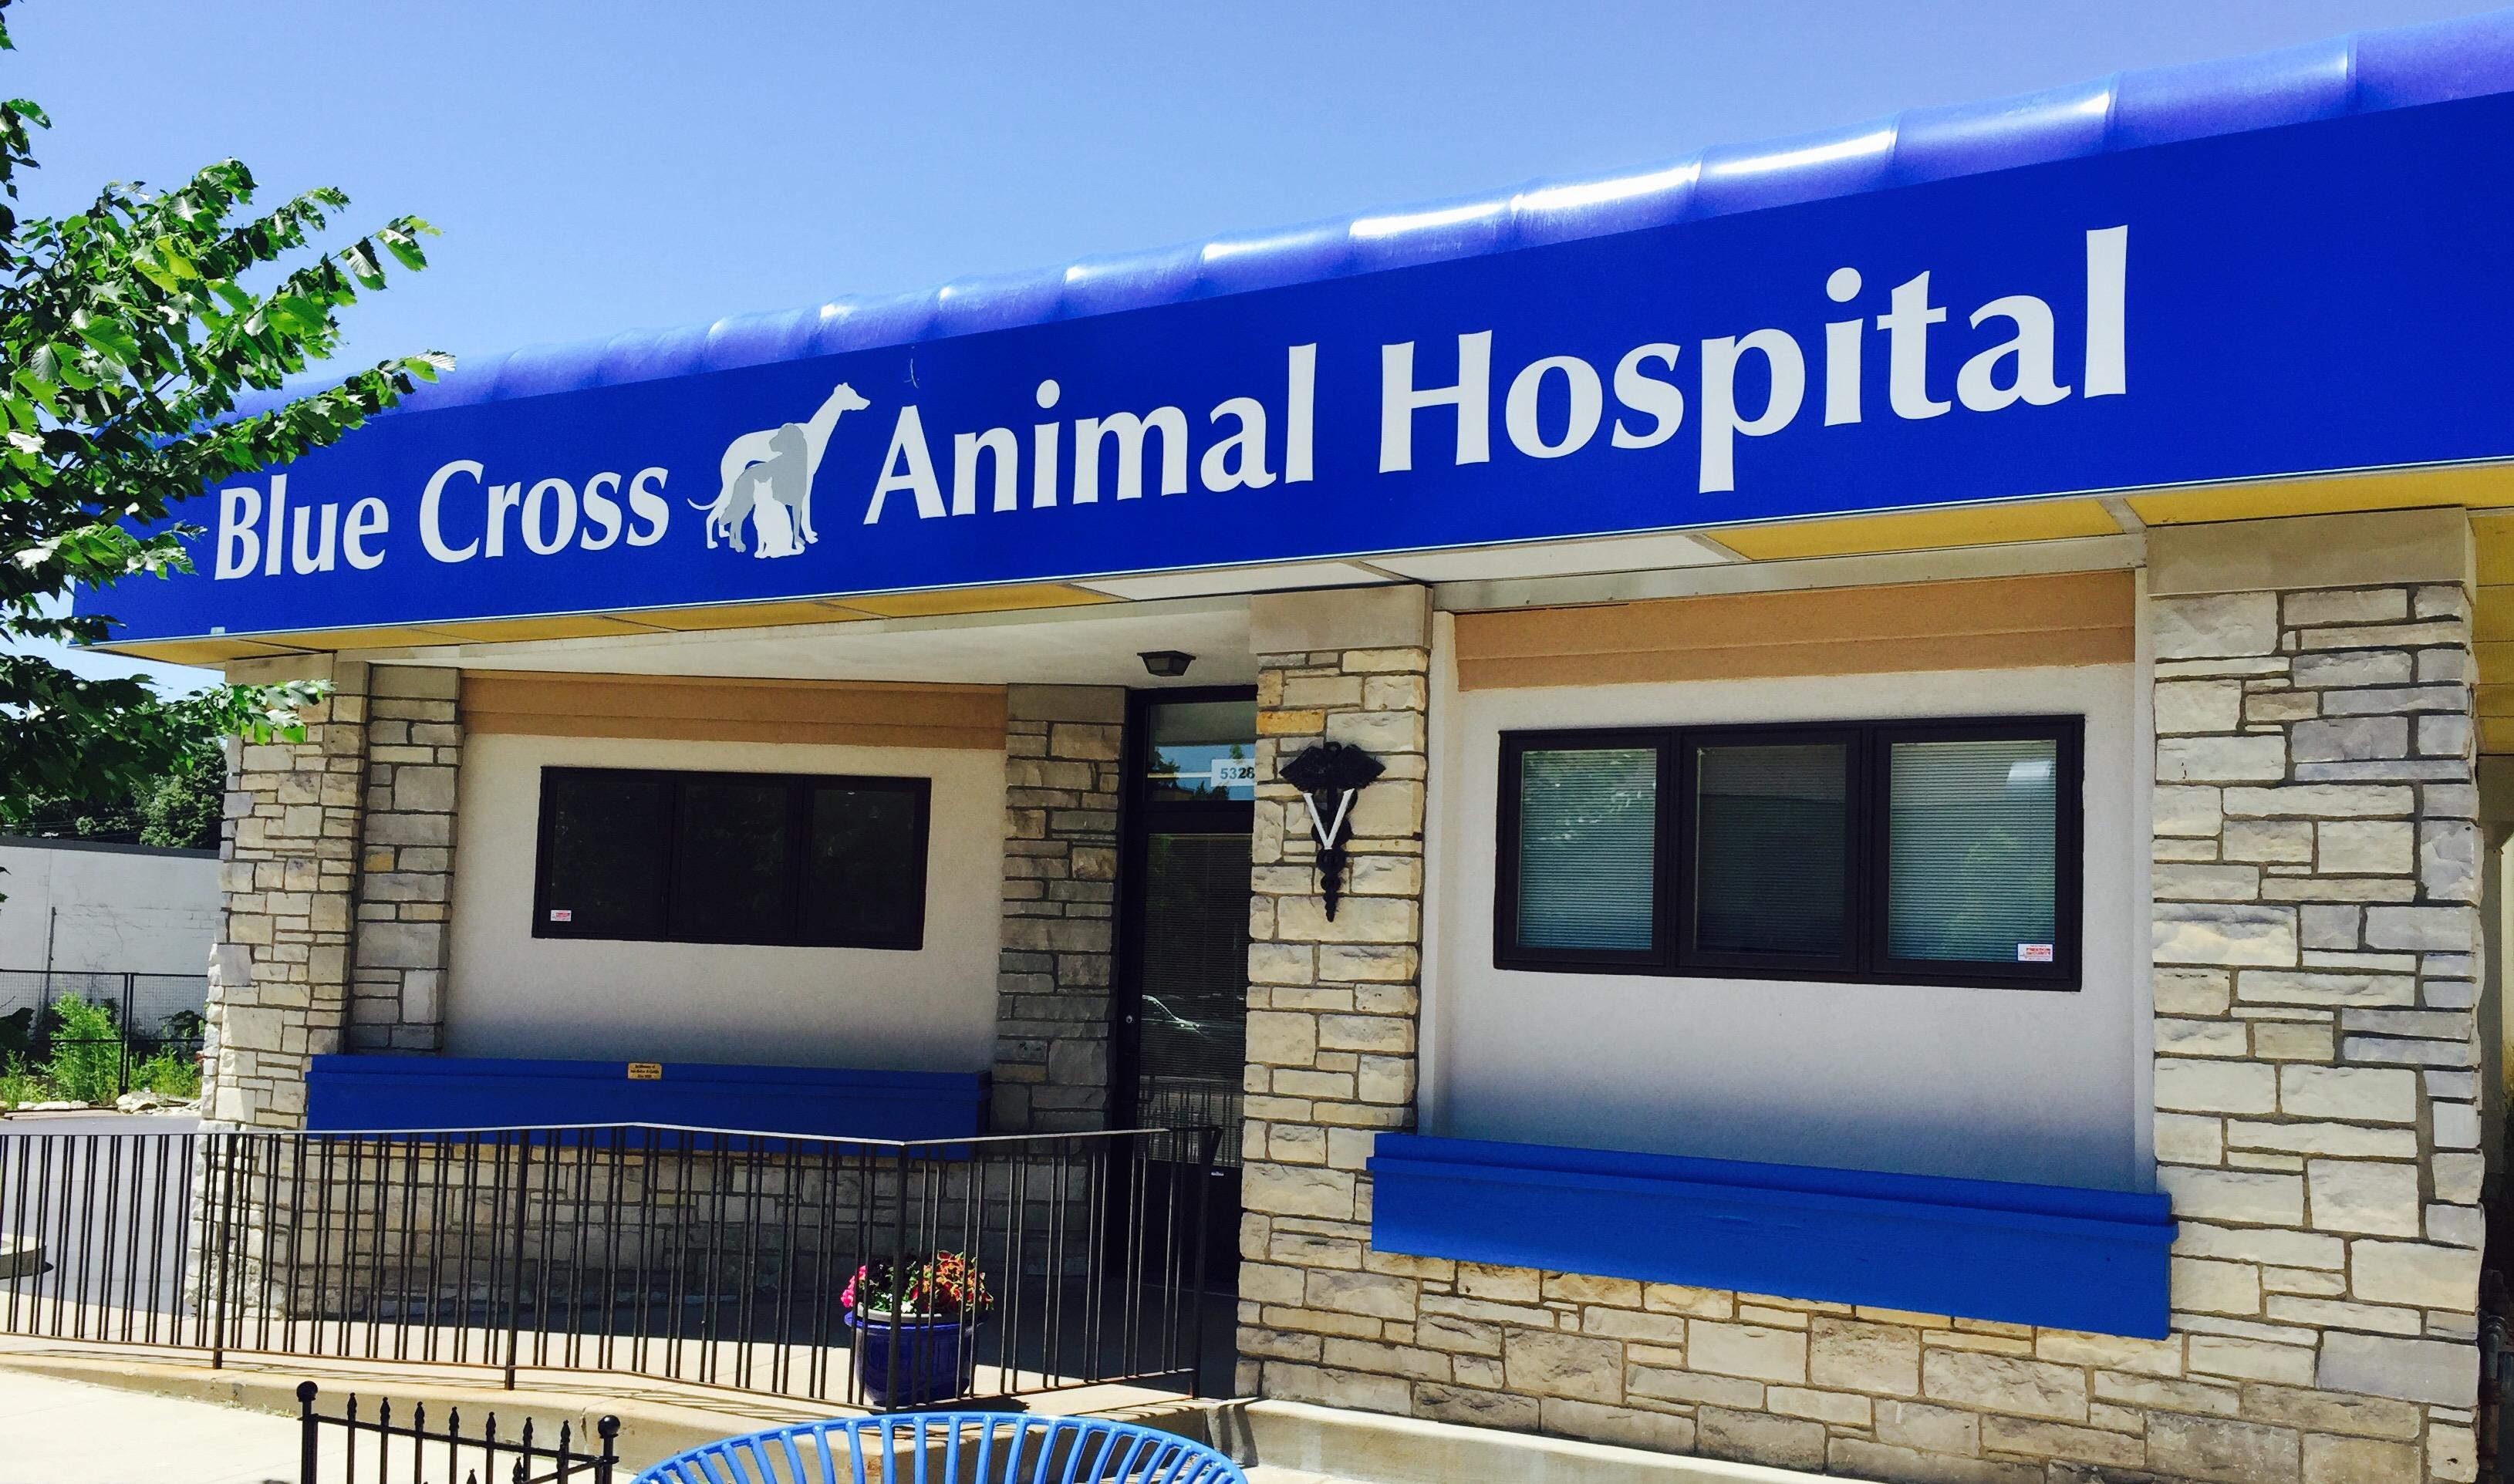 blue cross animal hospital  lyndale ave  minneapolis mn  ypcom